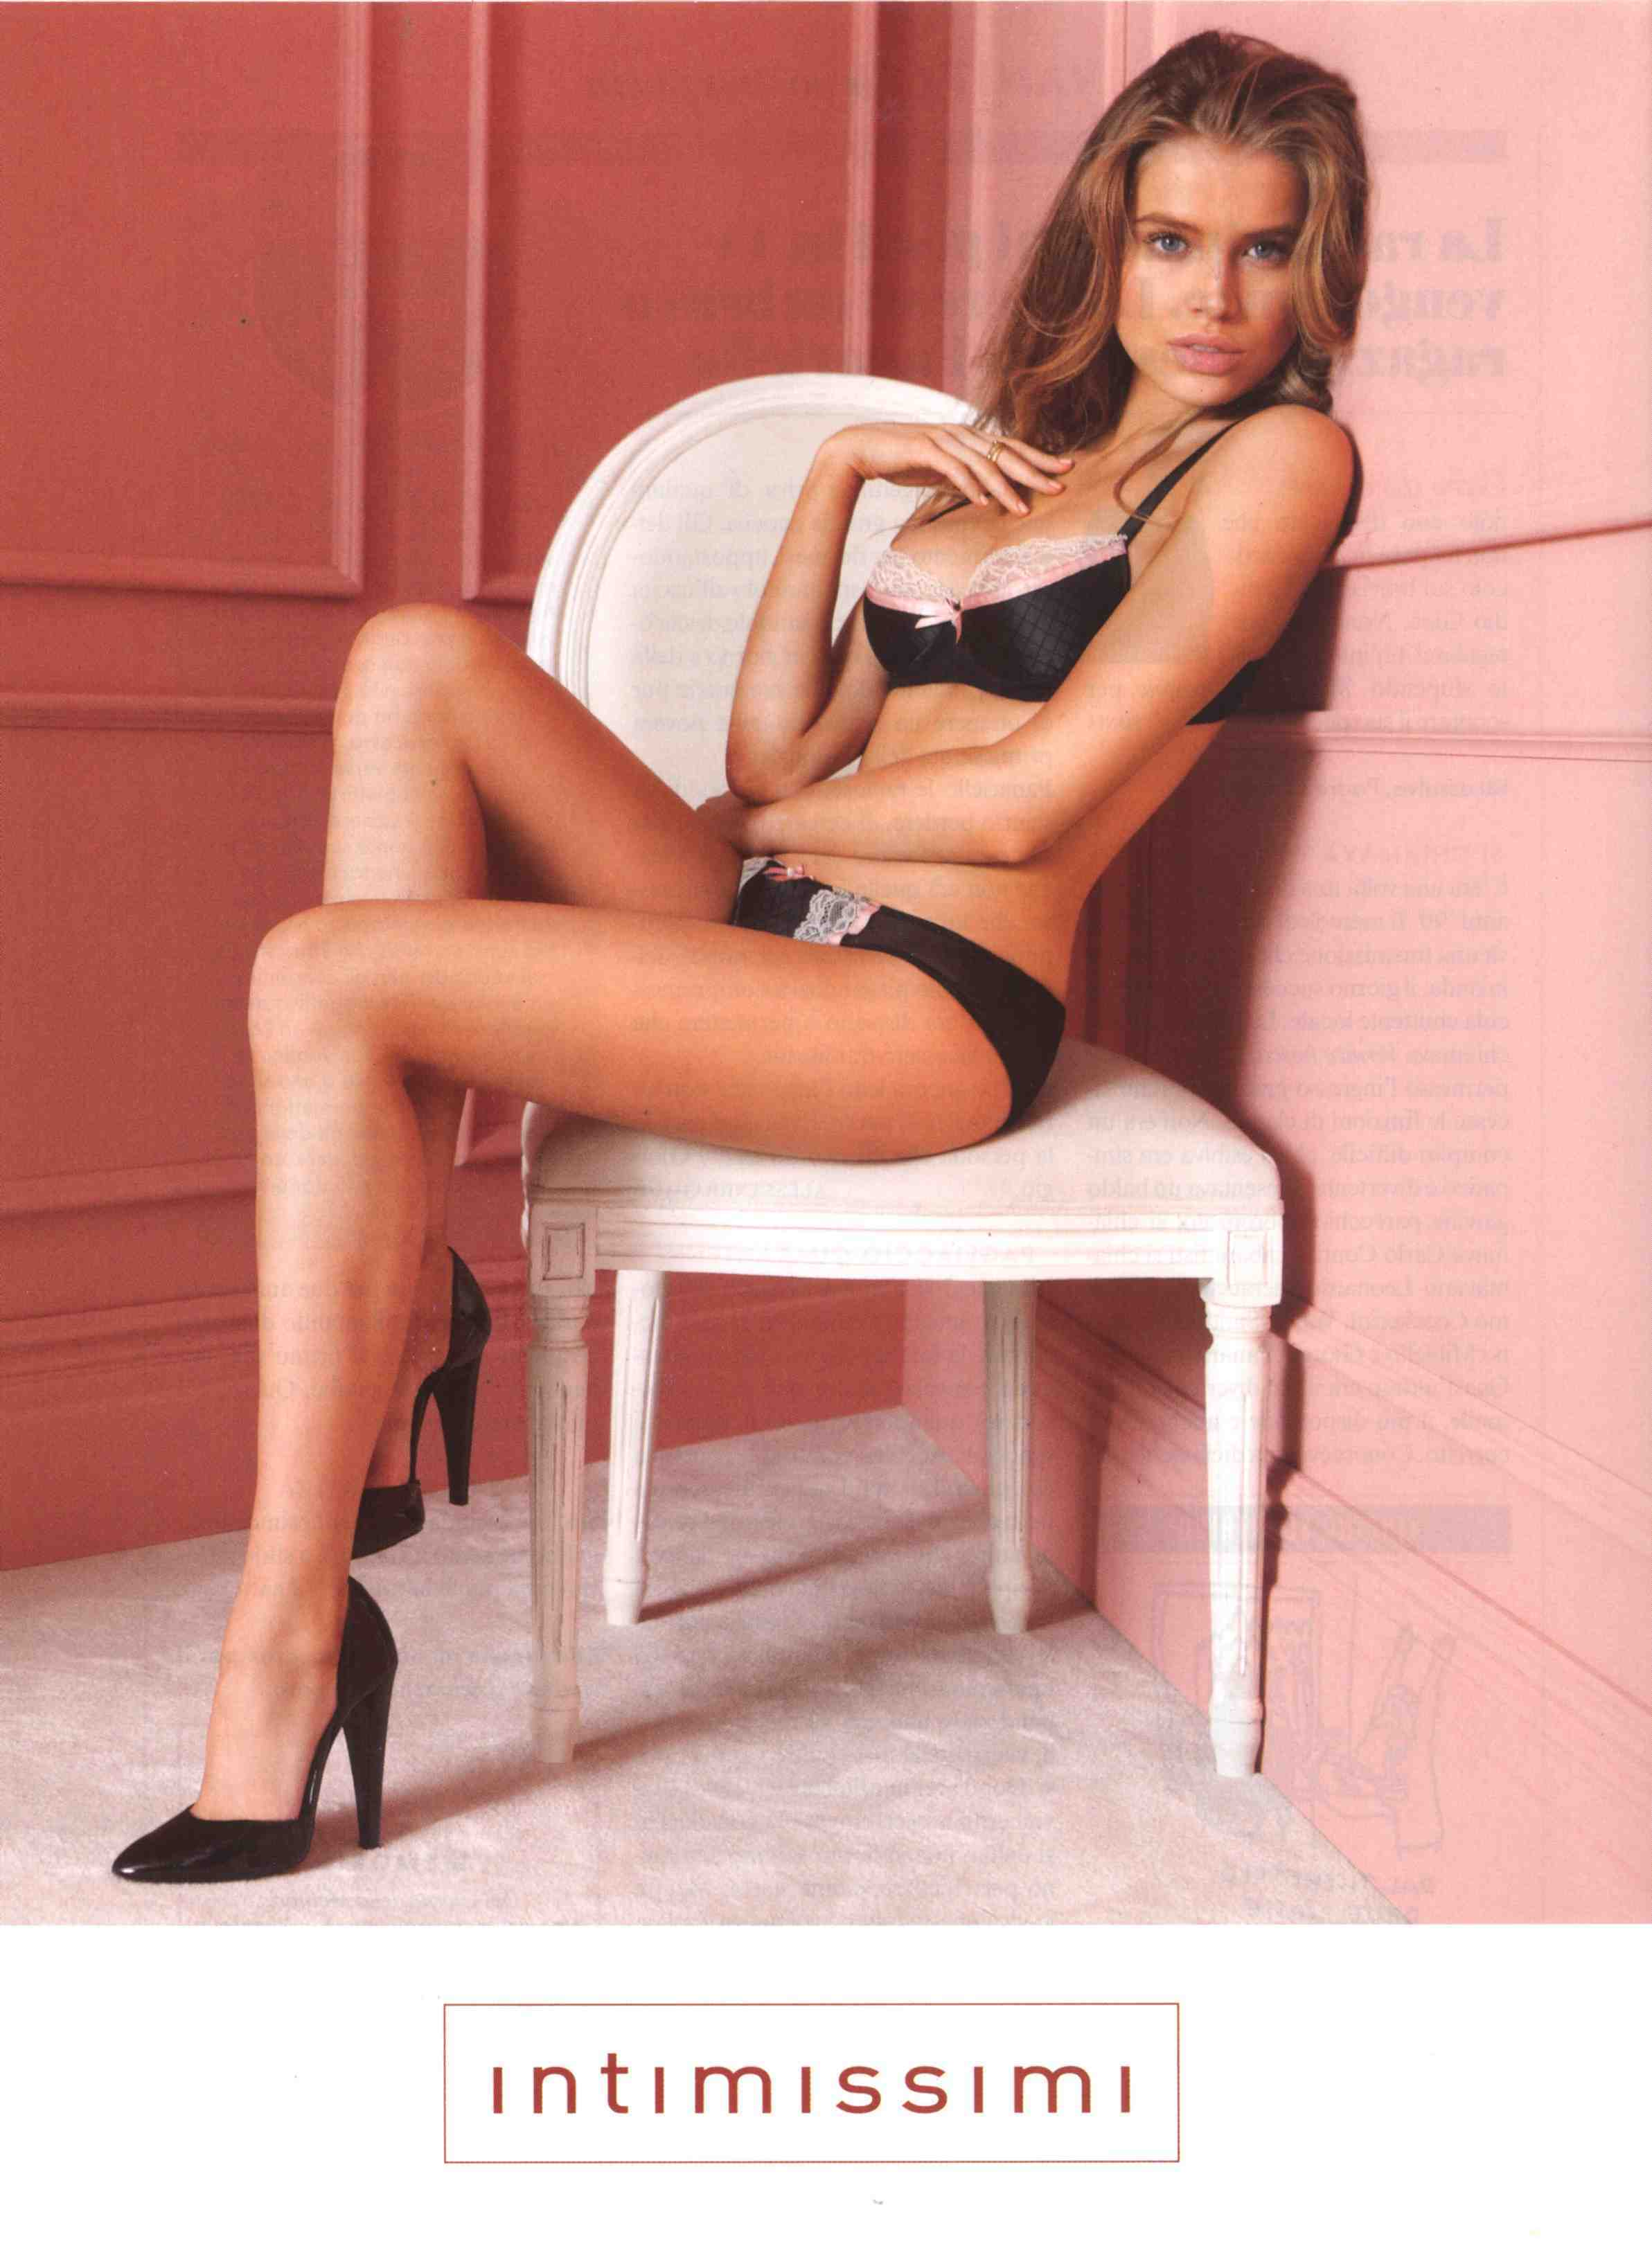 Image search: Tanya Model Y157